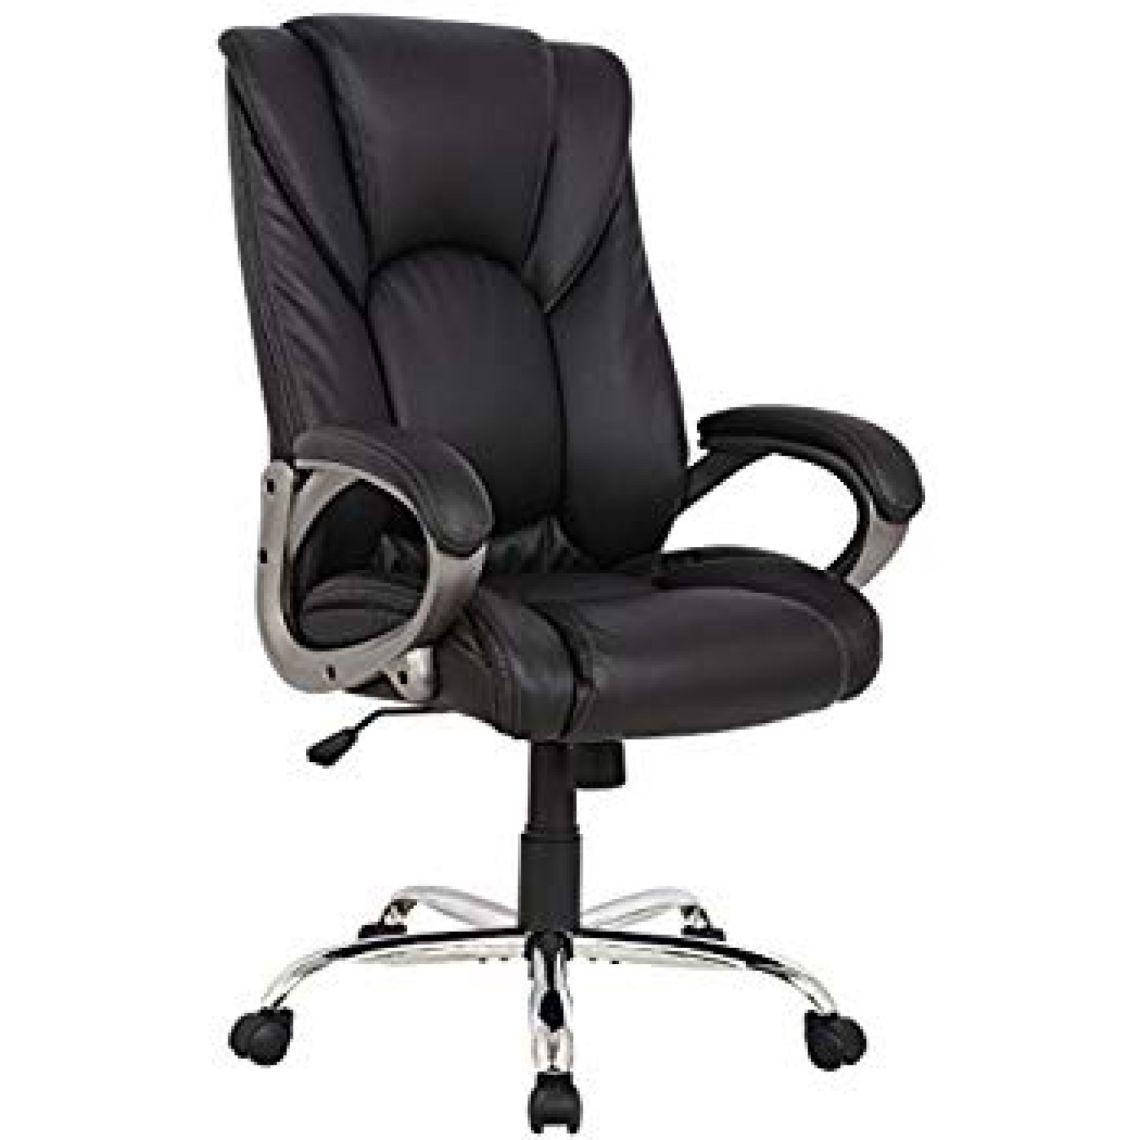 Amazon.com: VIVA OFFICE Swivel Office Chair, Black PU Leather: Kitchen & Dining